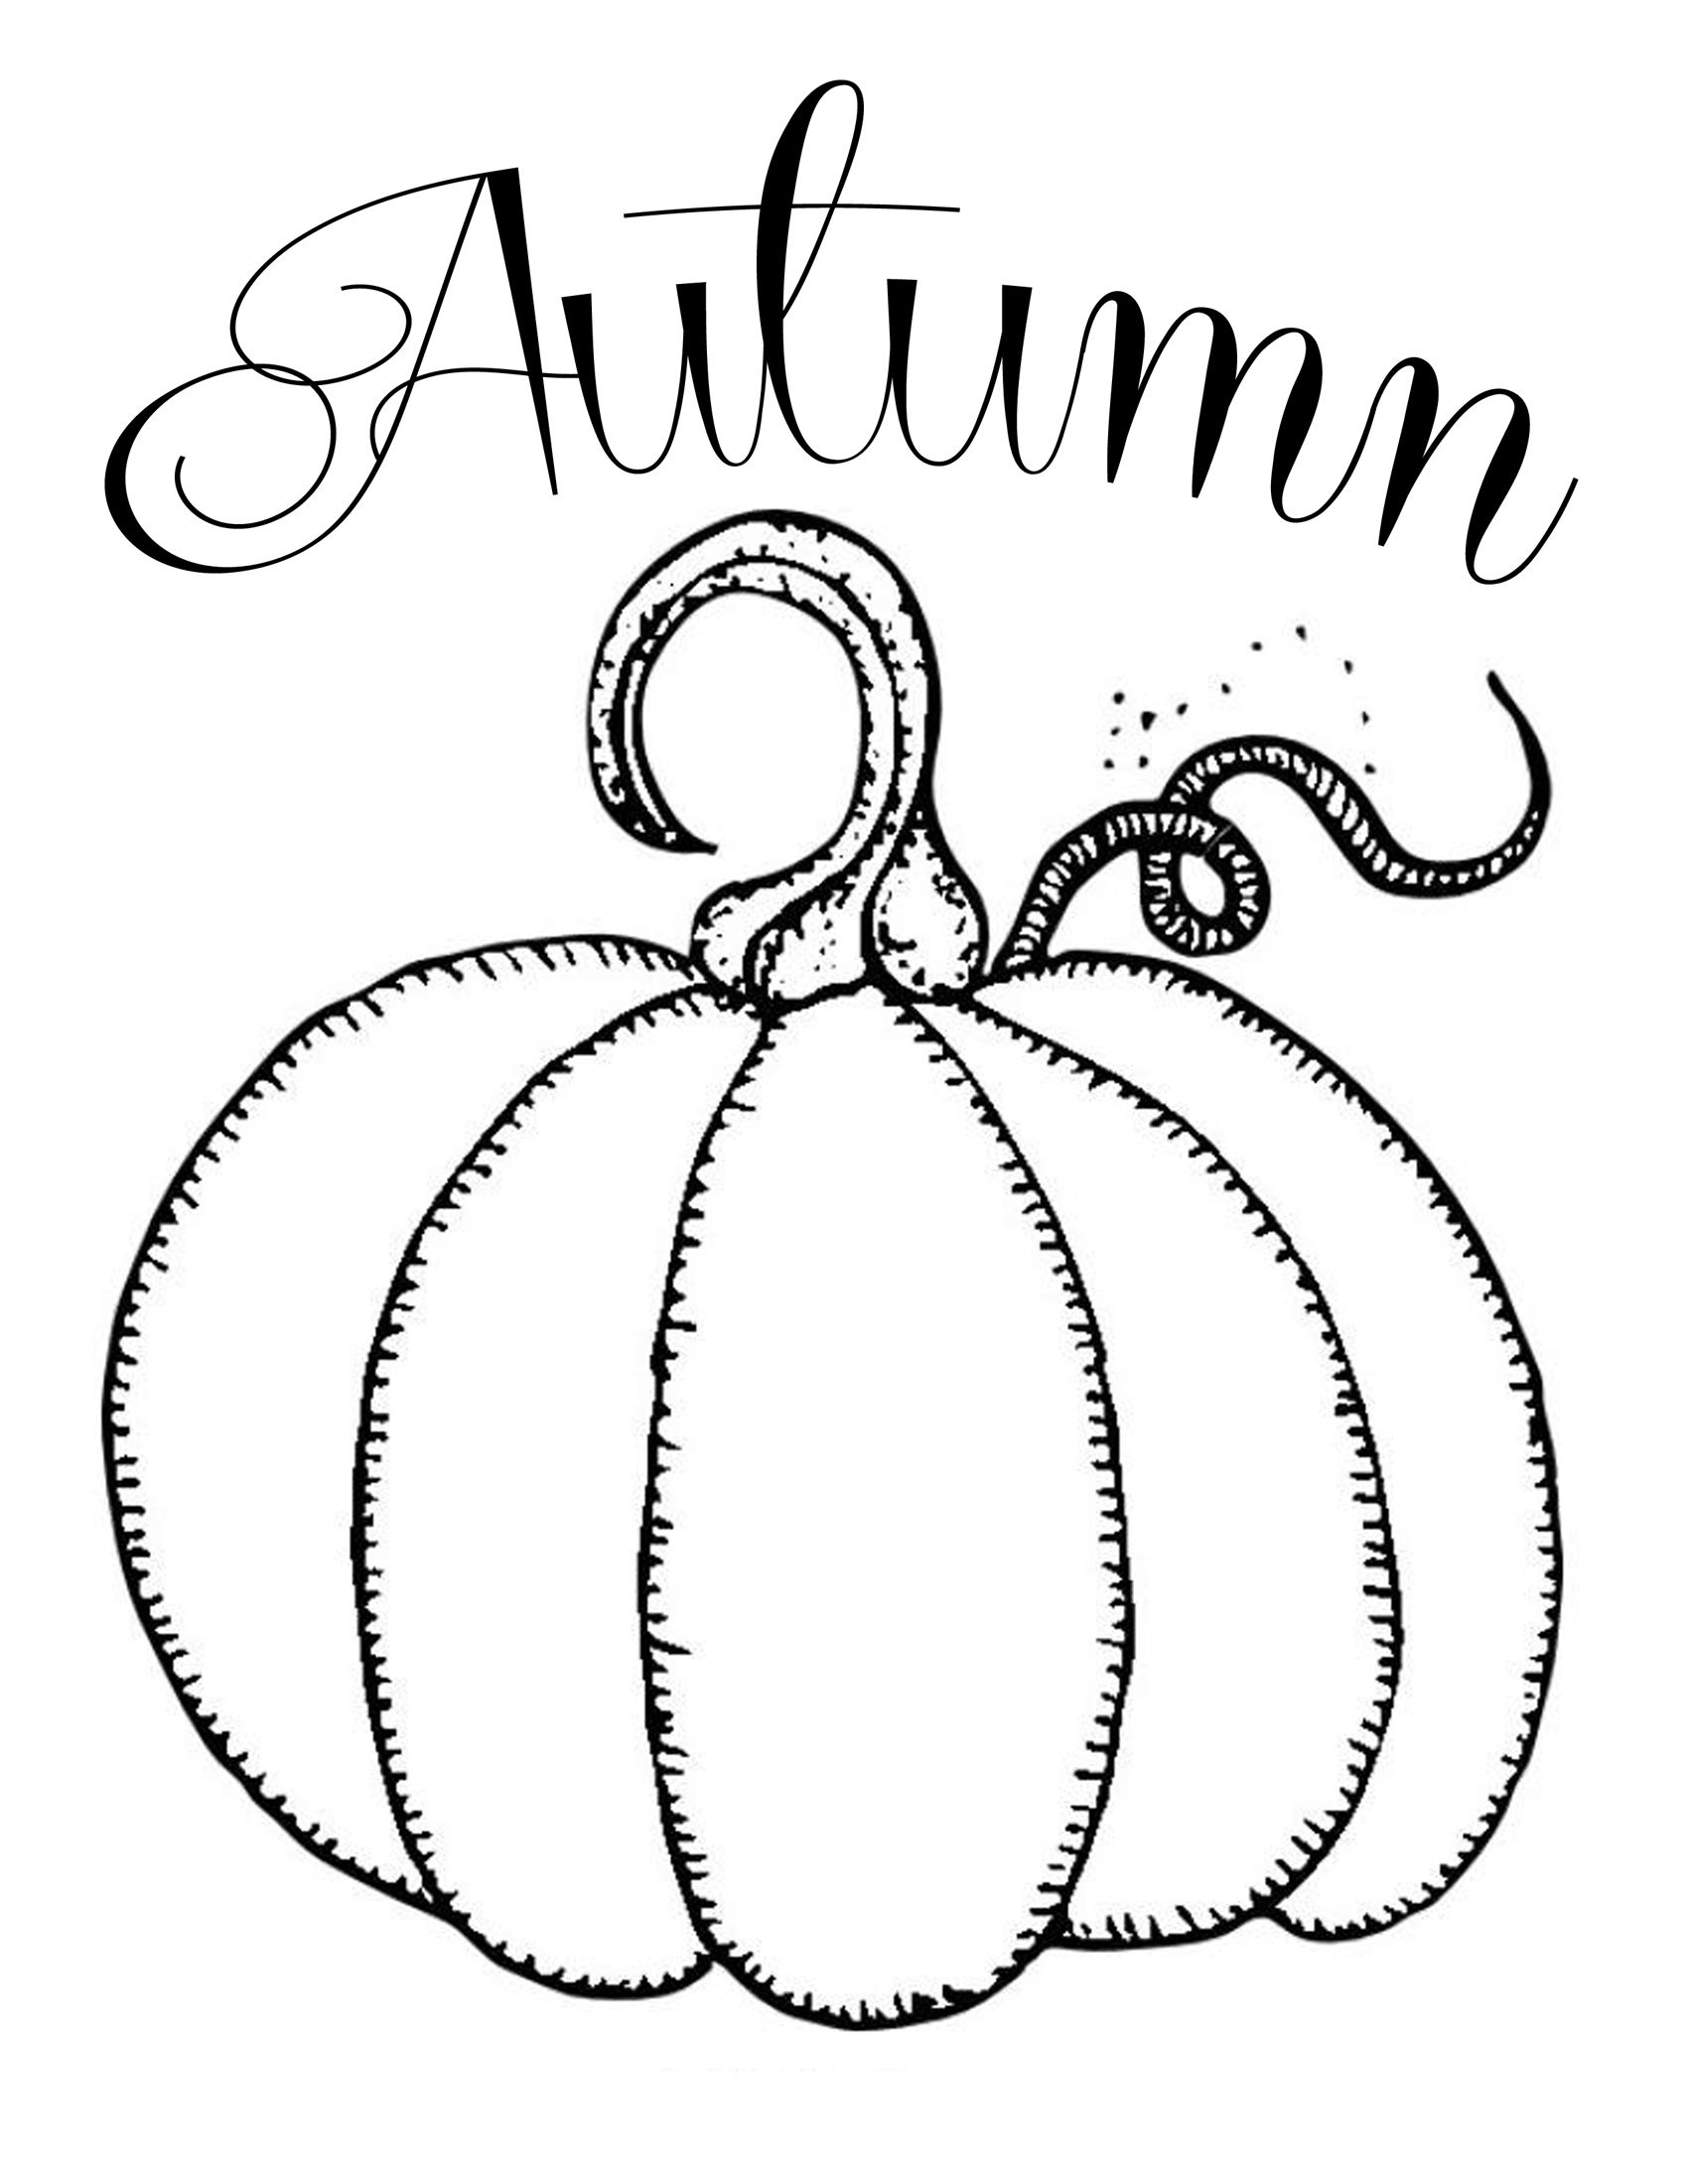 Free Printables ~ Chalkboard Autumn Pumpkin   Fonts And Printables - Free Printable Pumpkin Books